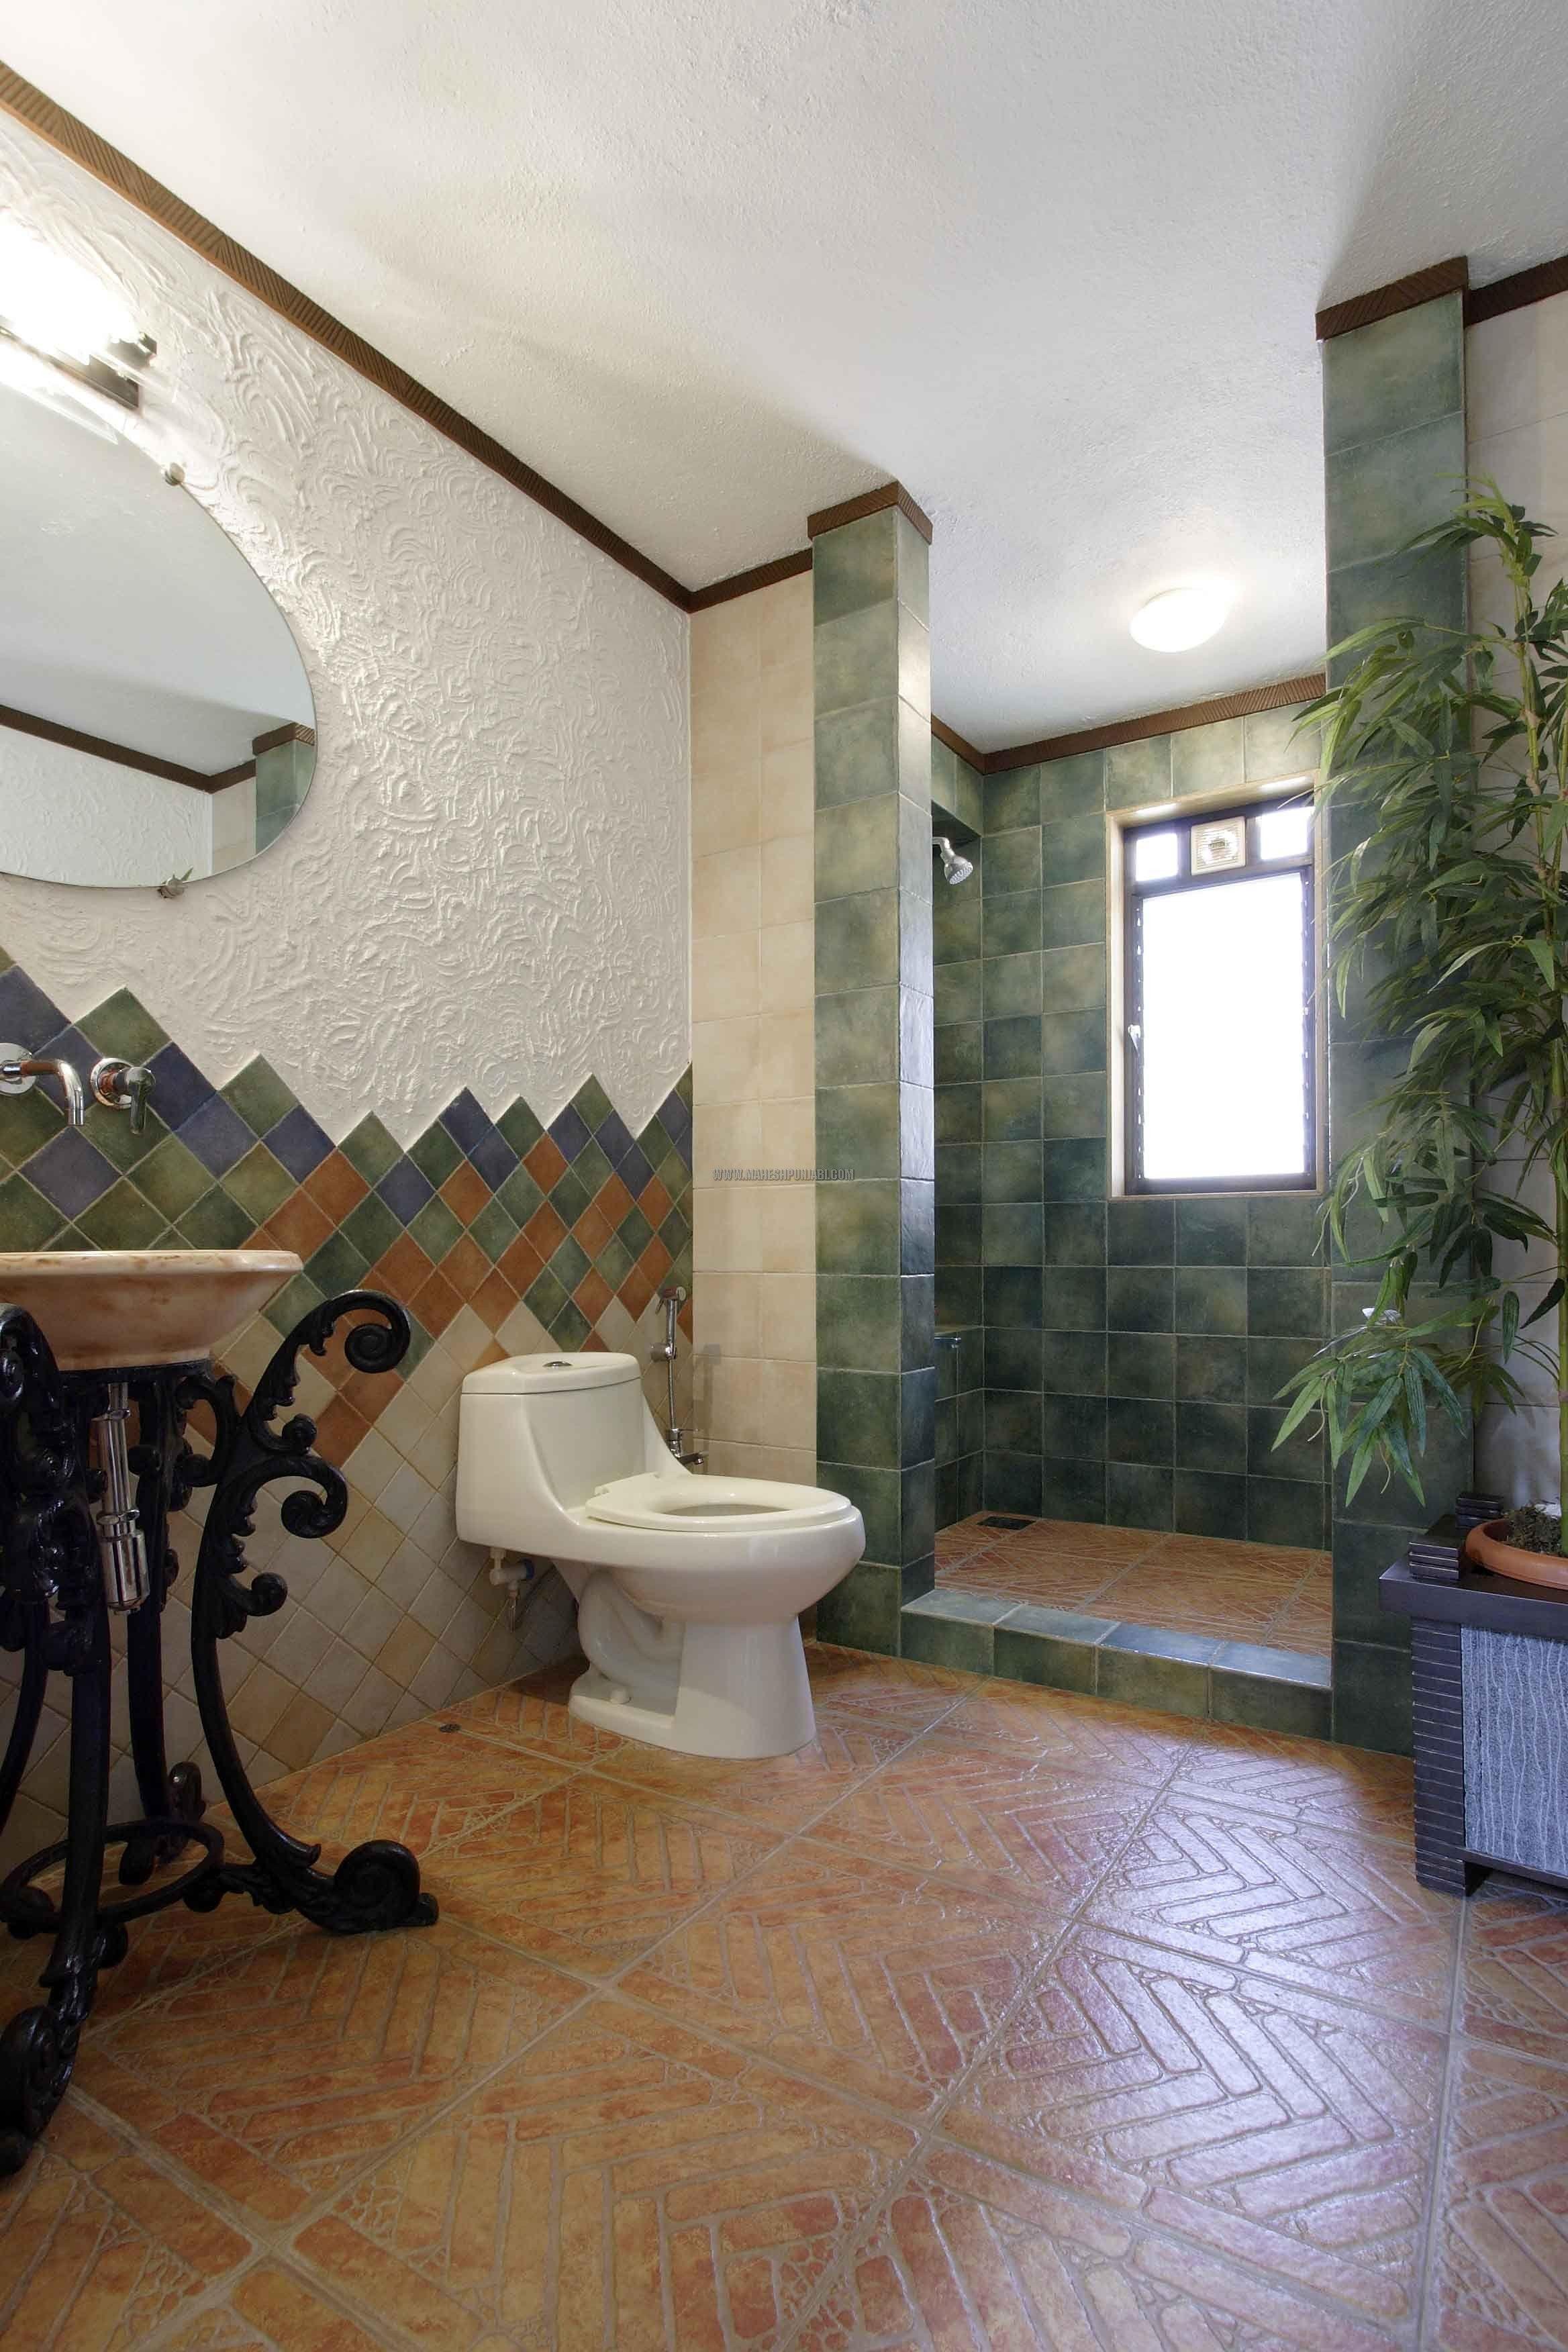 bathroom designs by mahesh punjabi associates image 10 maheshpunjabiassociates interiorupdates interiortrends